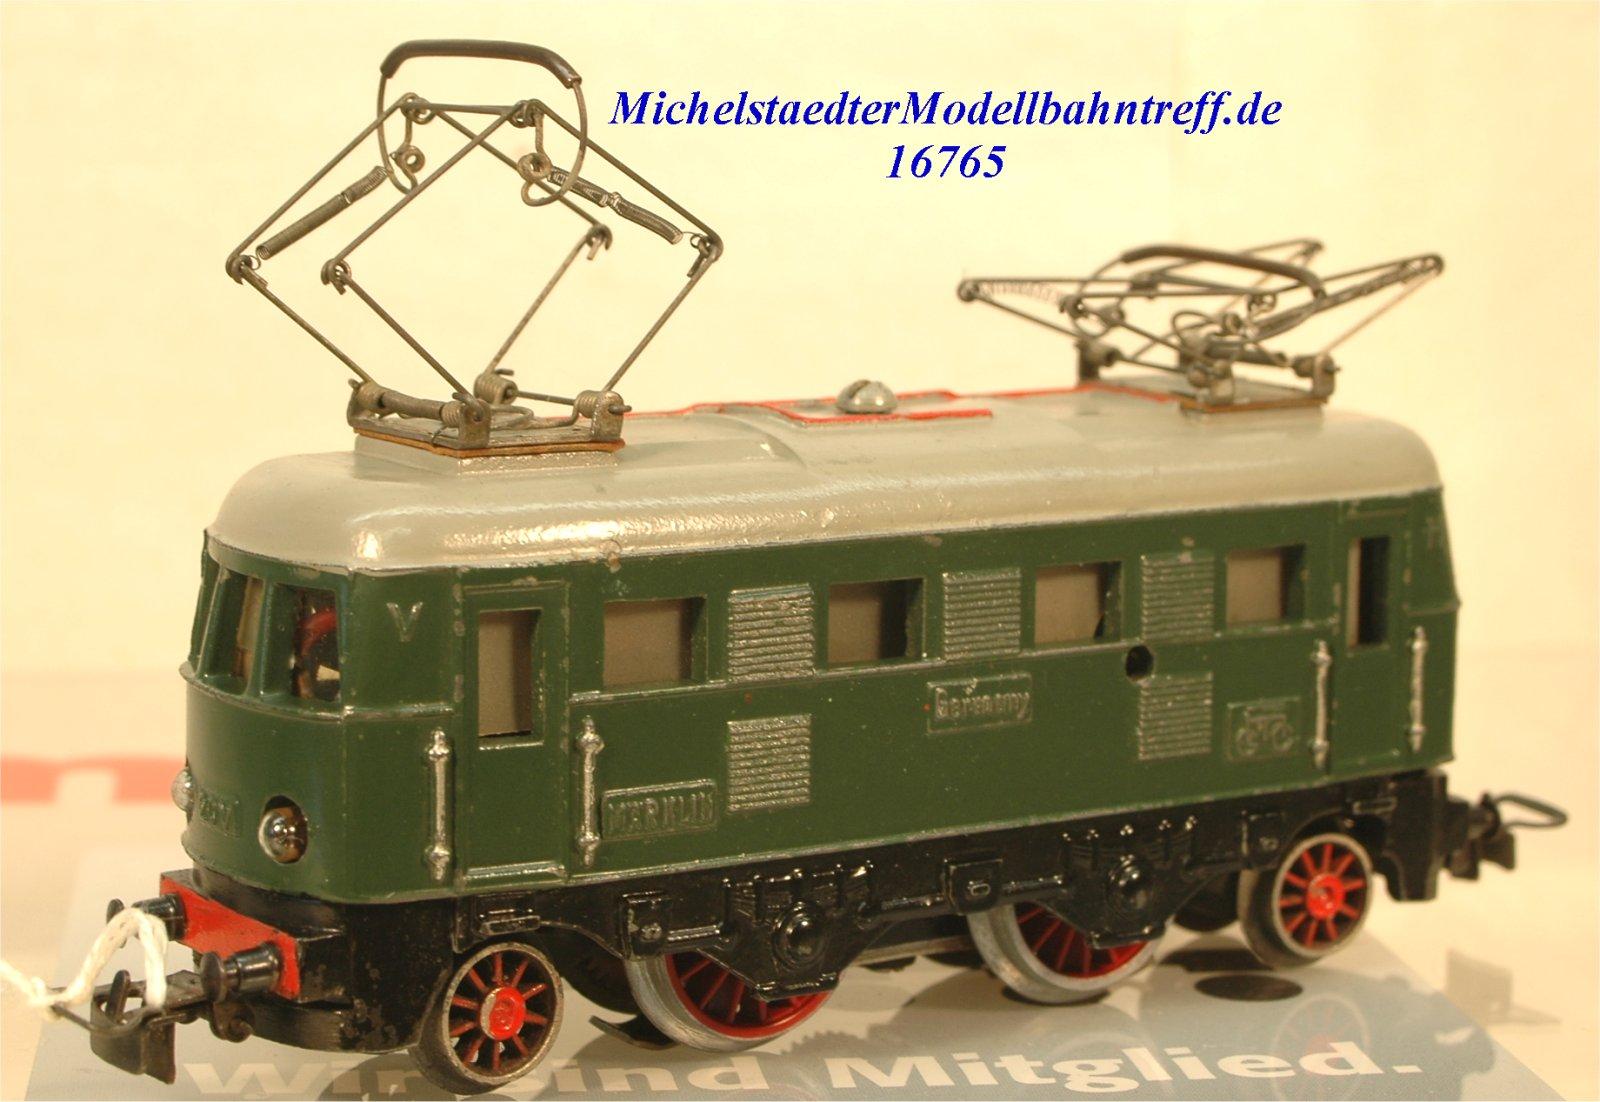 Märklin ES 800.1 E-Lok Achsfolge 1'B'1, (16765)